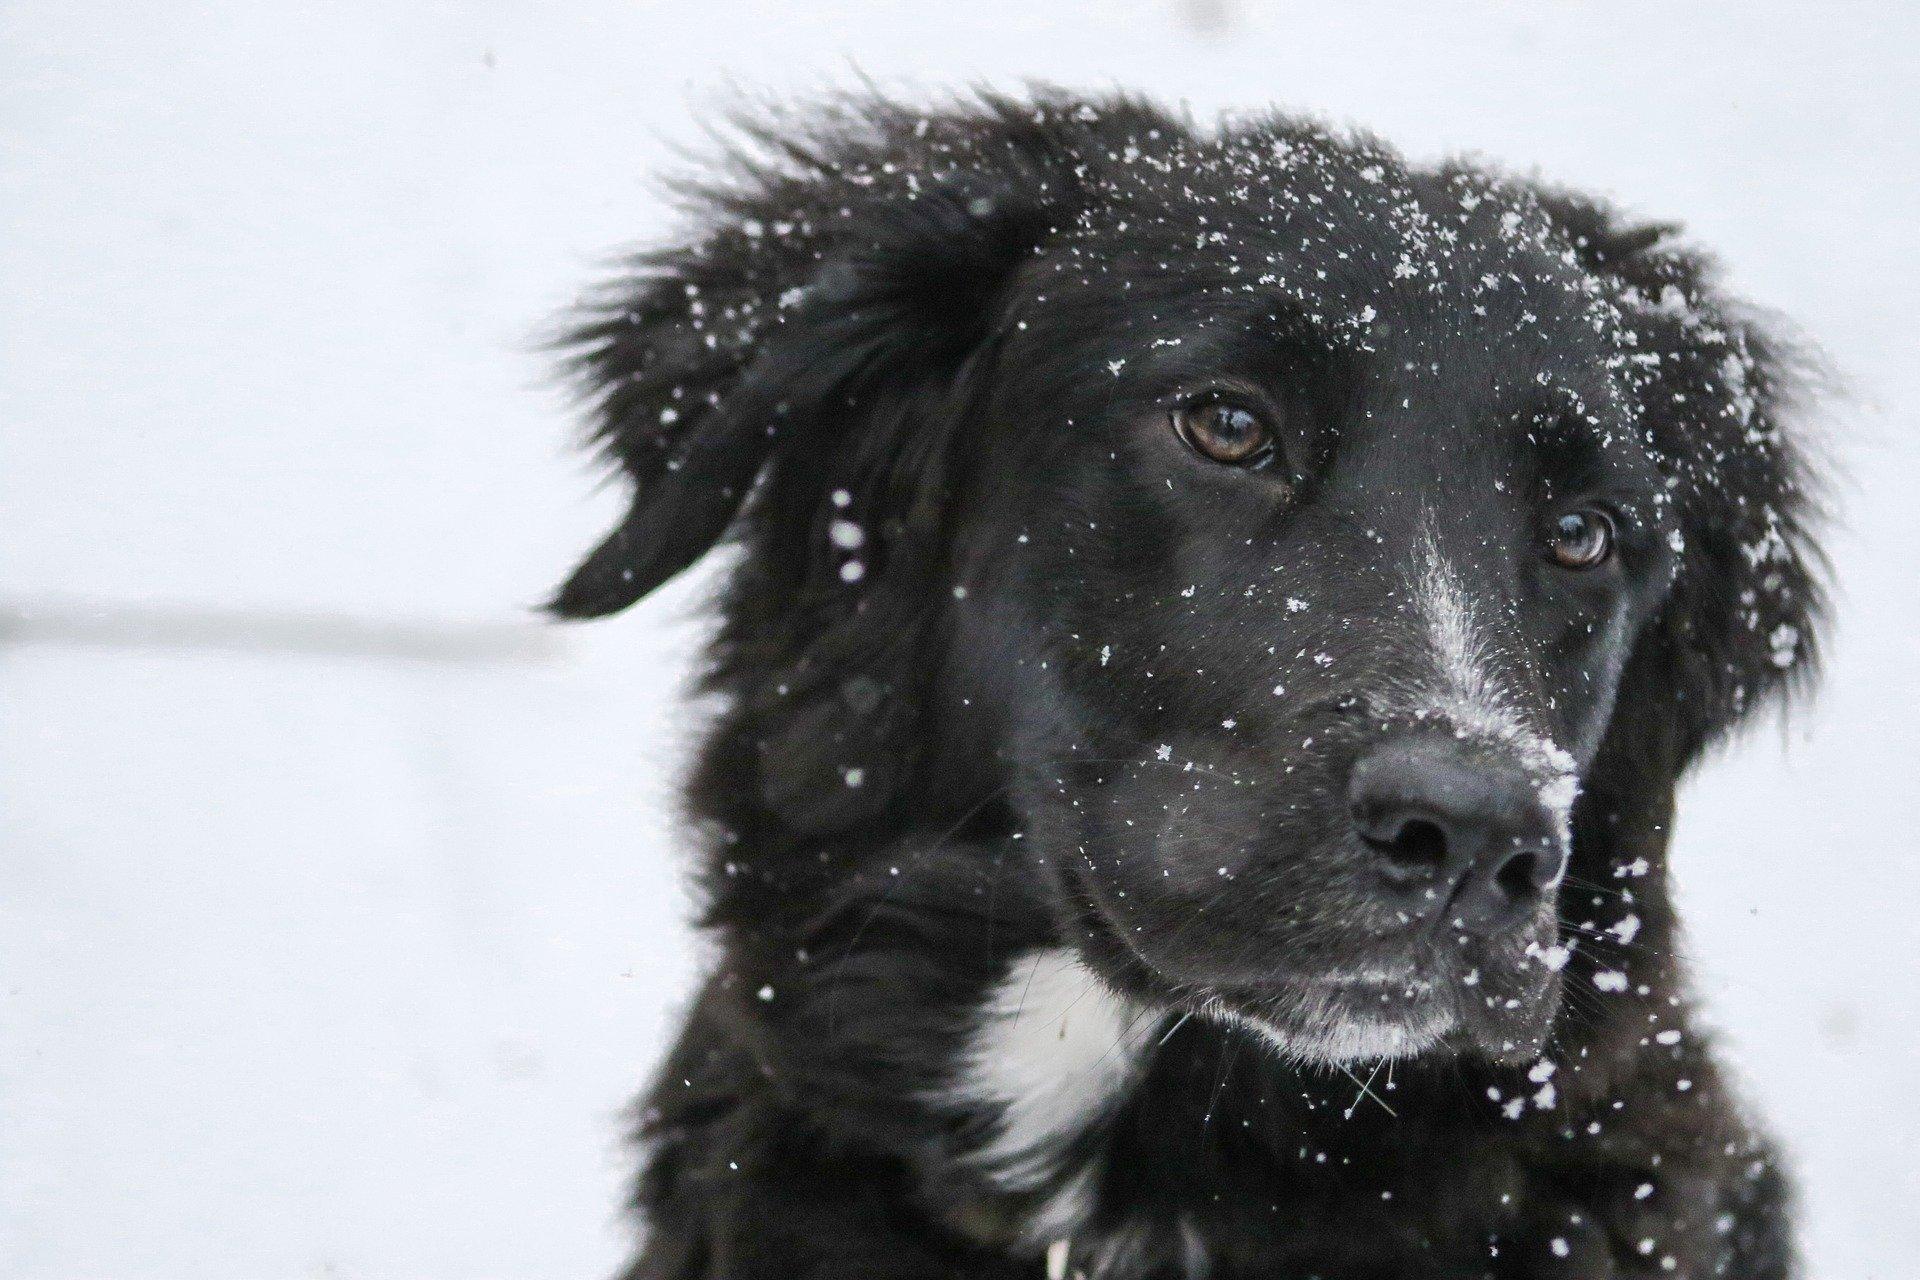 Zimski pes za zimske dni?